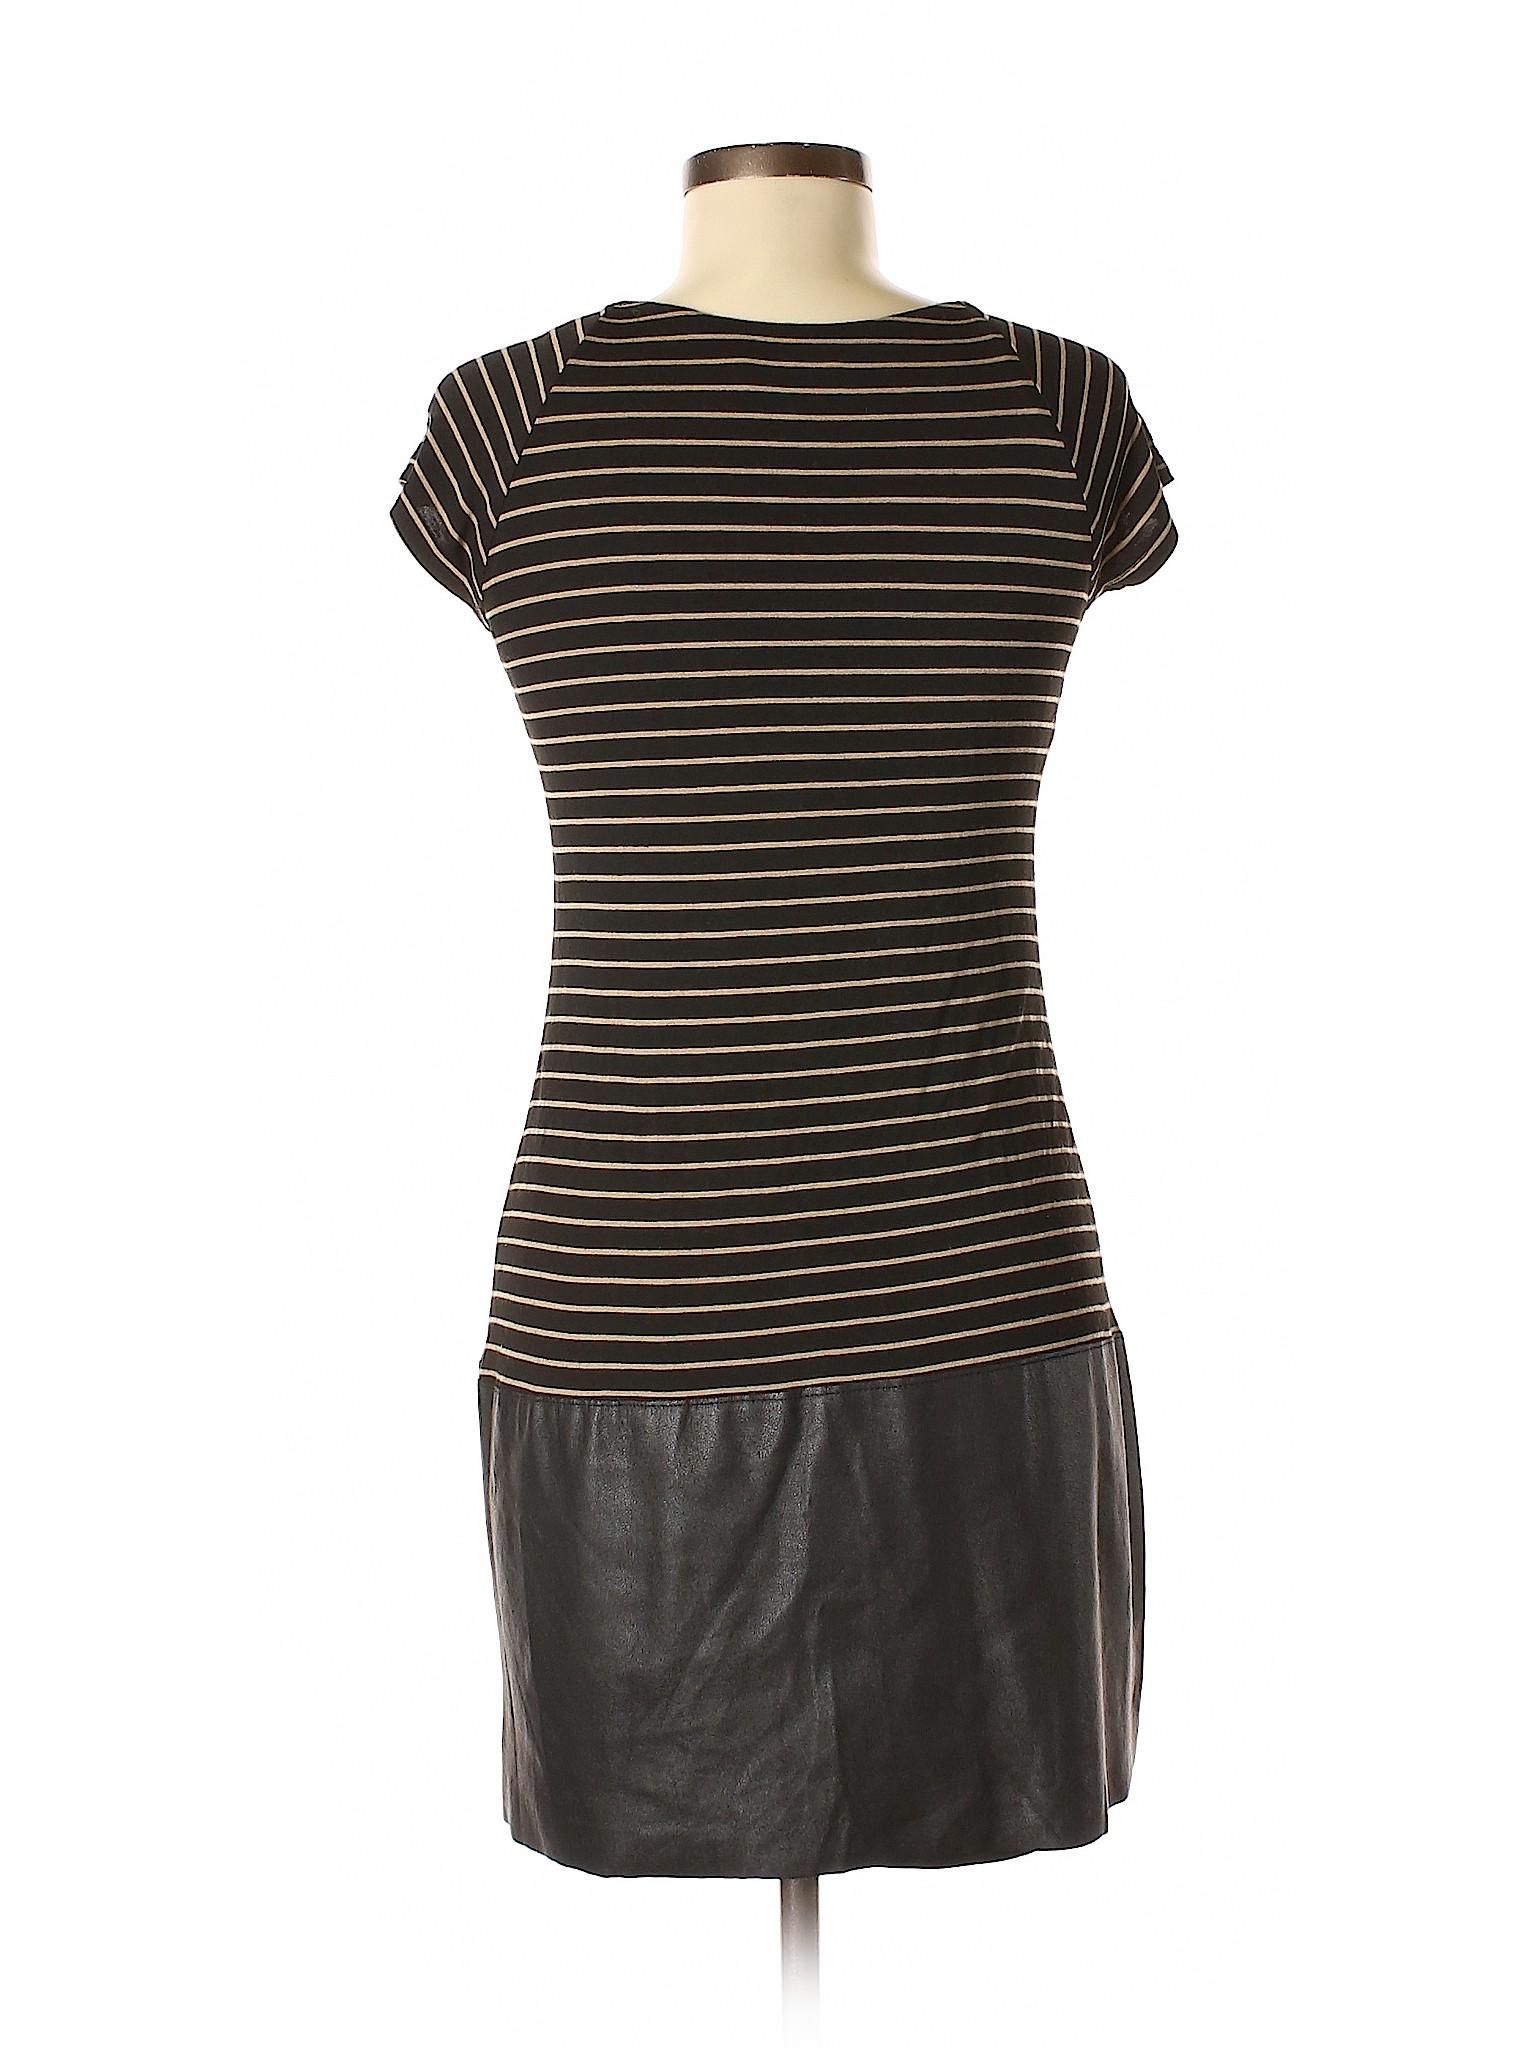 44 Dress Casual winter Bailey Boutique 8qwRzEnX